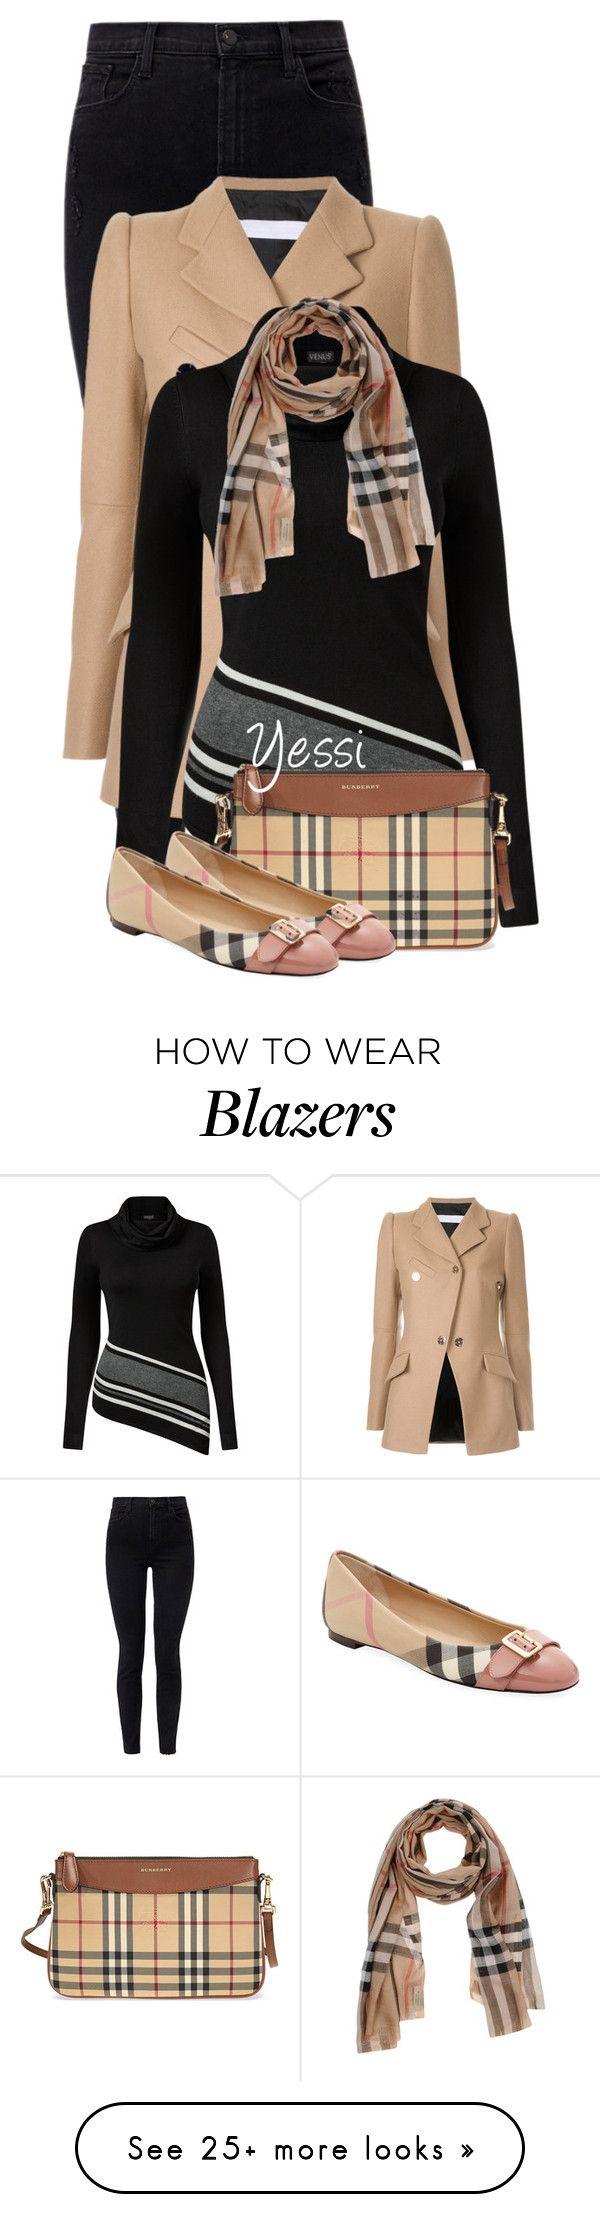 """~  Plaid Bag & Shoe  ~"" by pretty-fashion-designs on Polyvore featuring J Brand, Tamuna Ingorokva, Venus and Burberry"